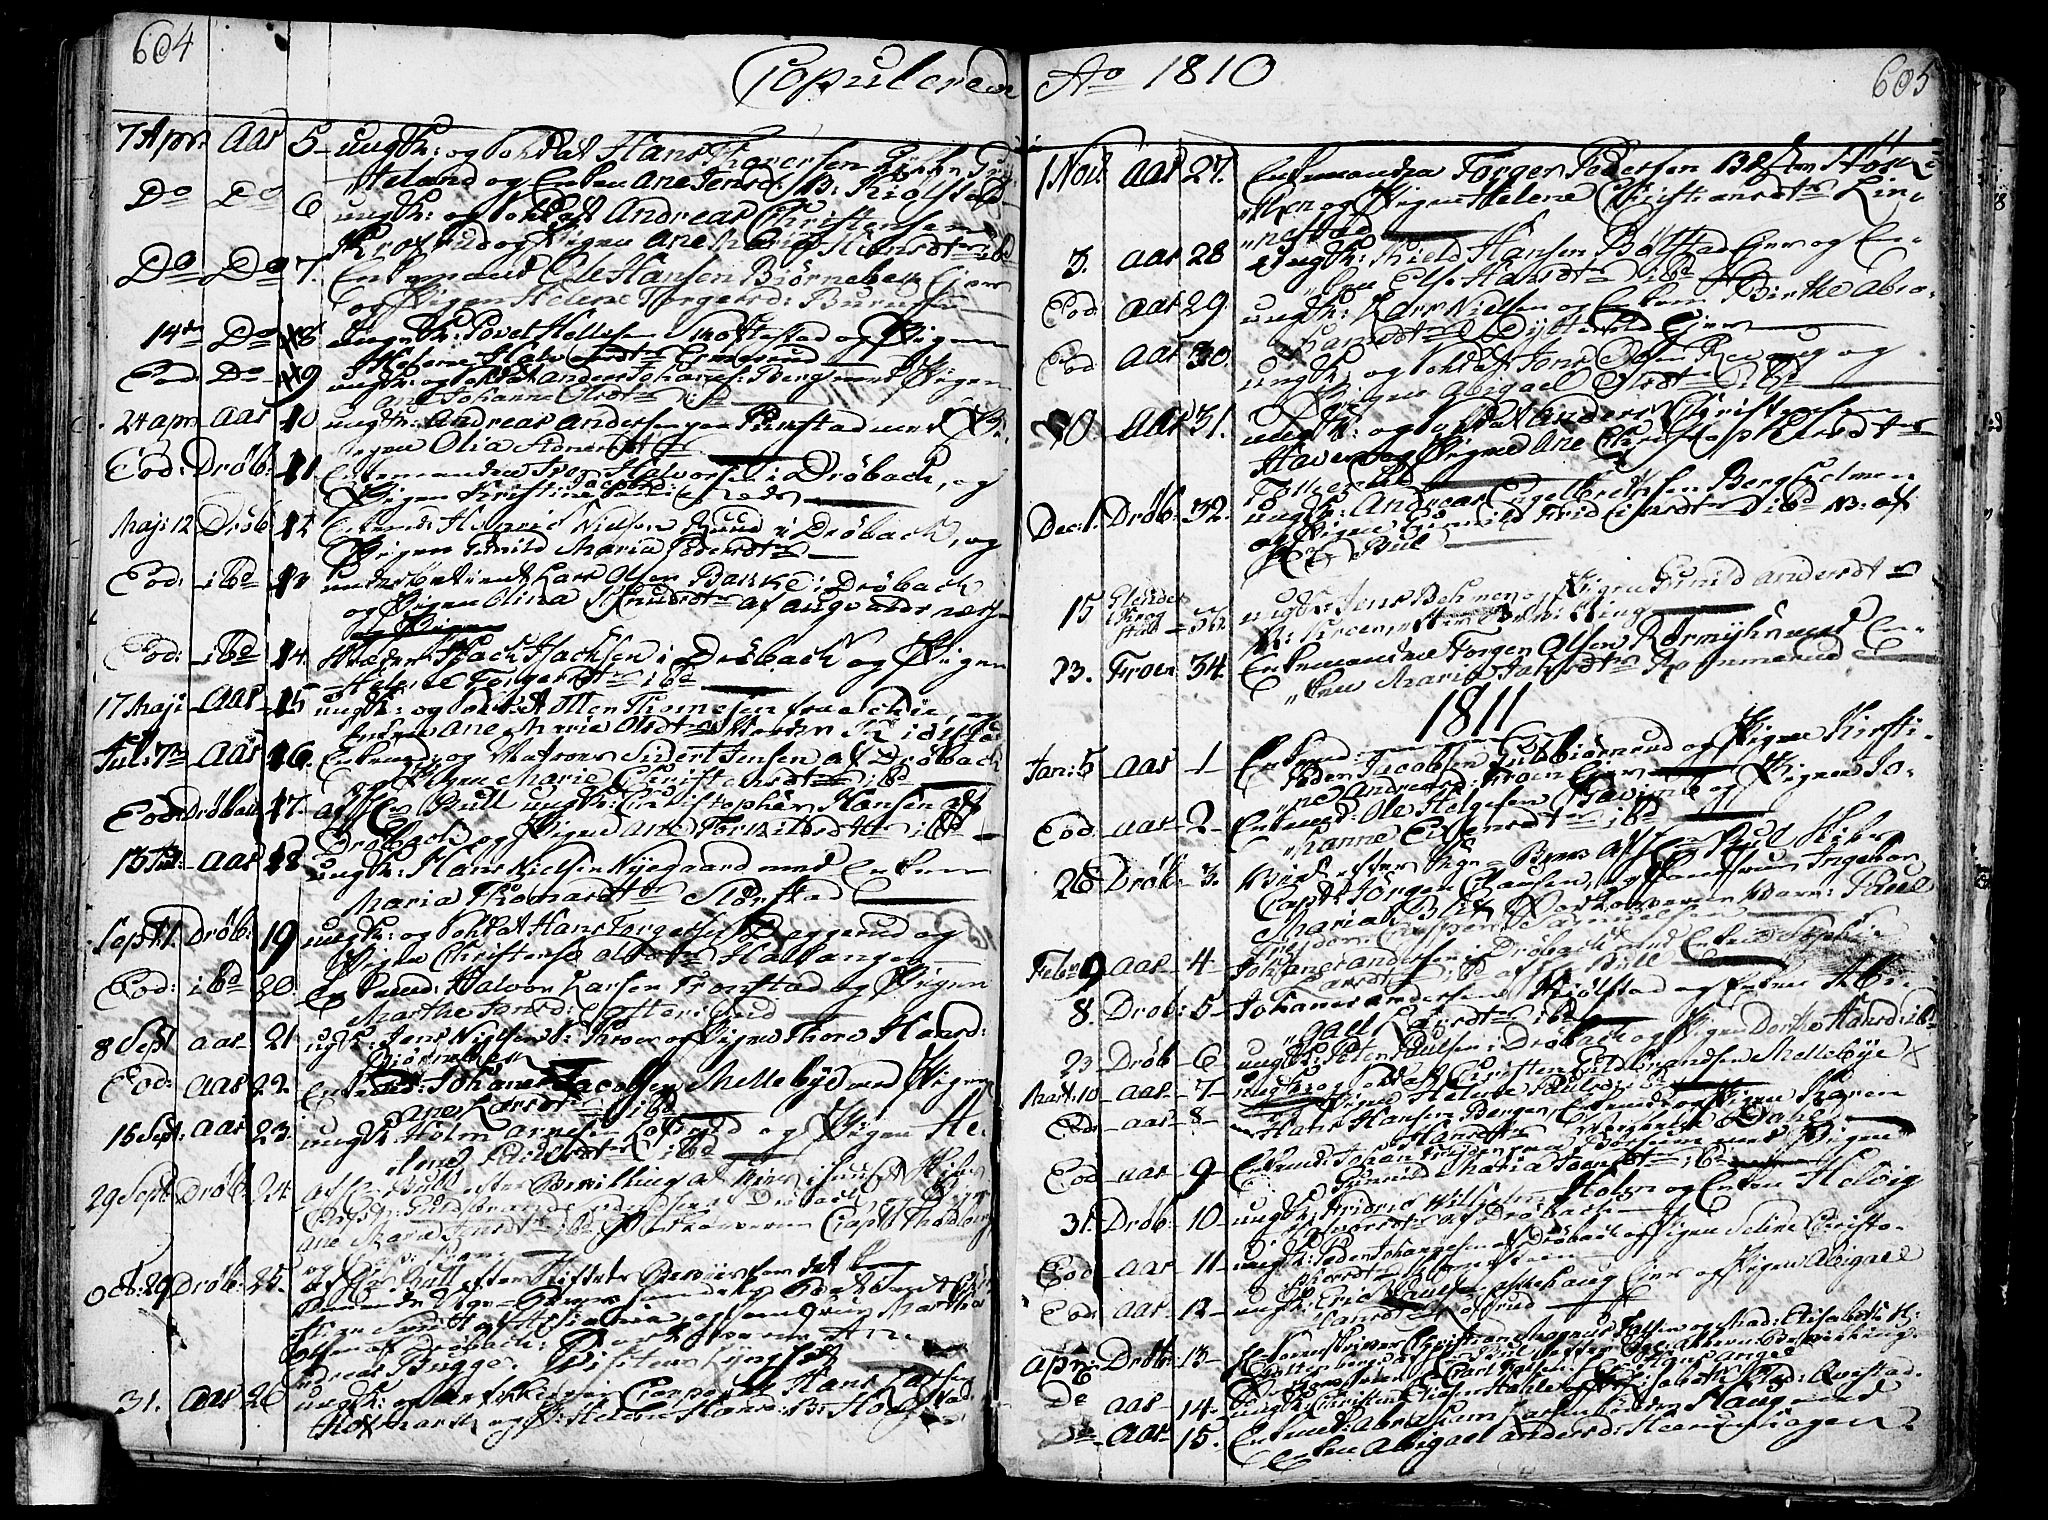 SAO, Ås prestekontor Kirkebøker, F/Fa/L0002: Ministerialbok nr. I 2, 1778-1813, s. 604-605